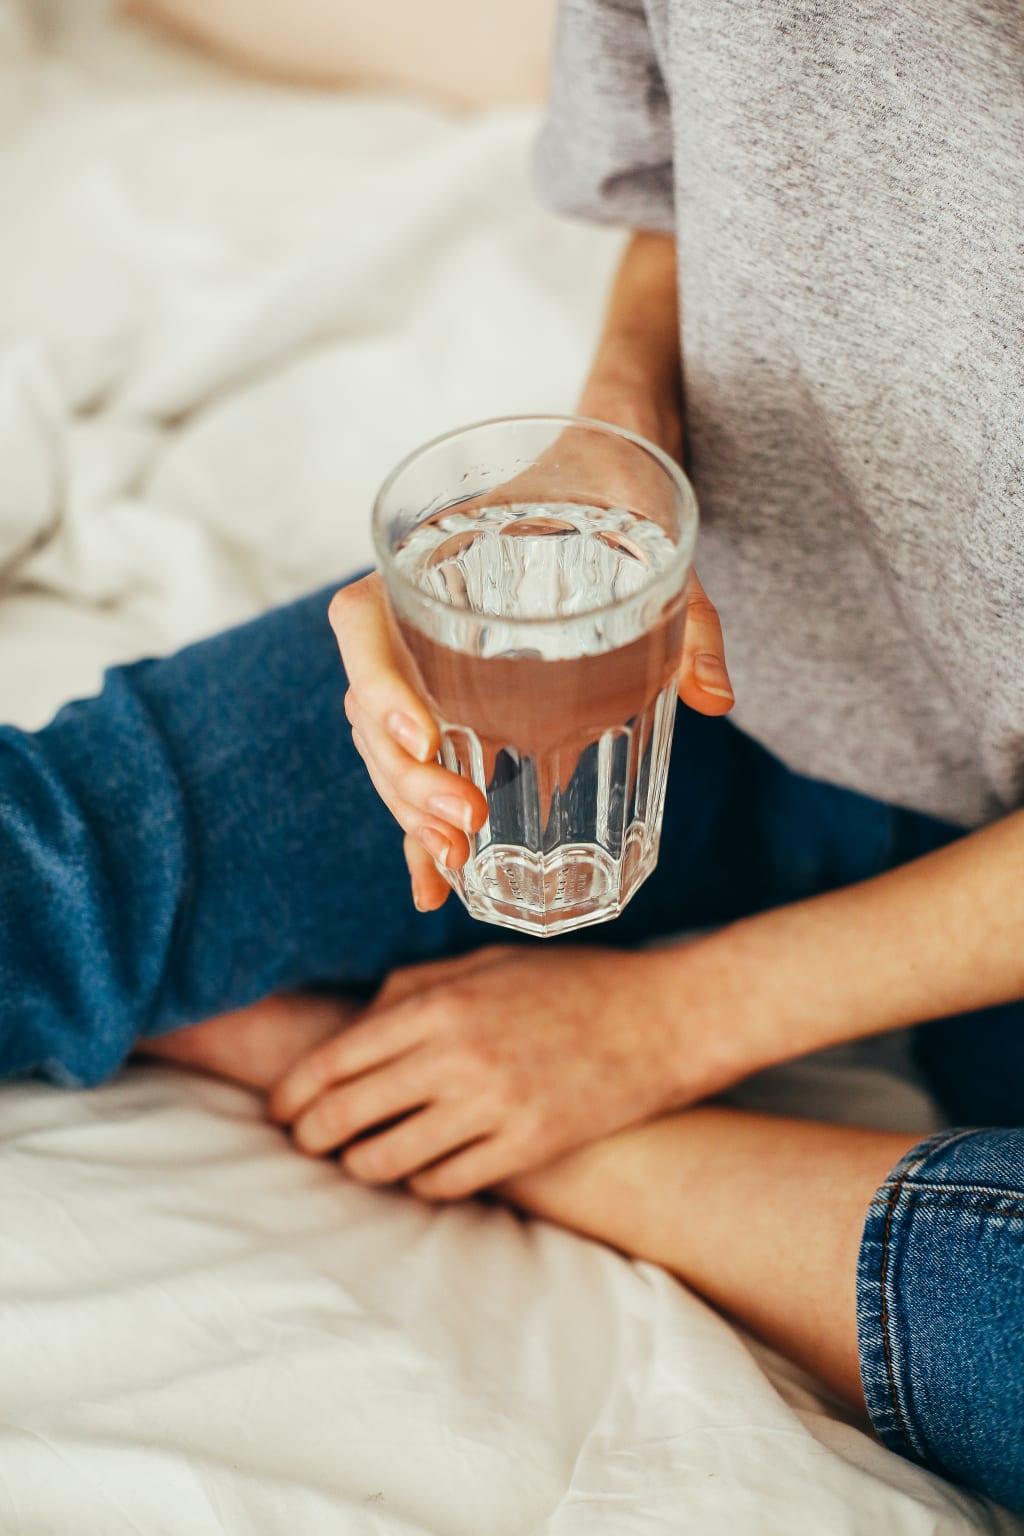 How Your Gut Health Can Impact Your Sleep